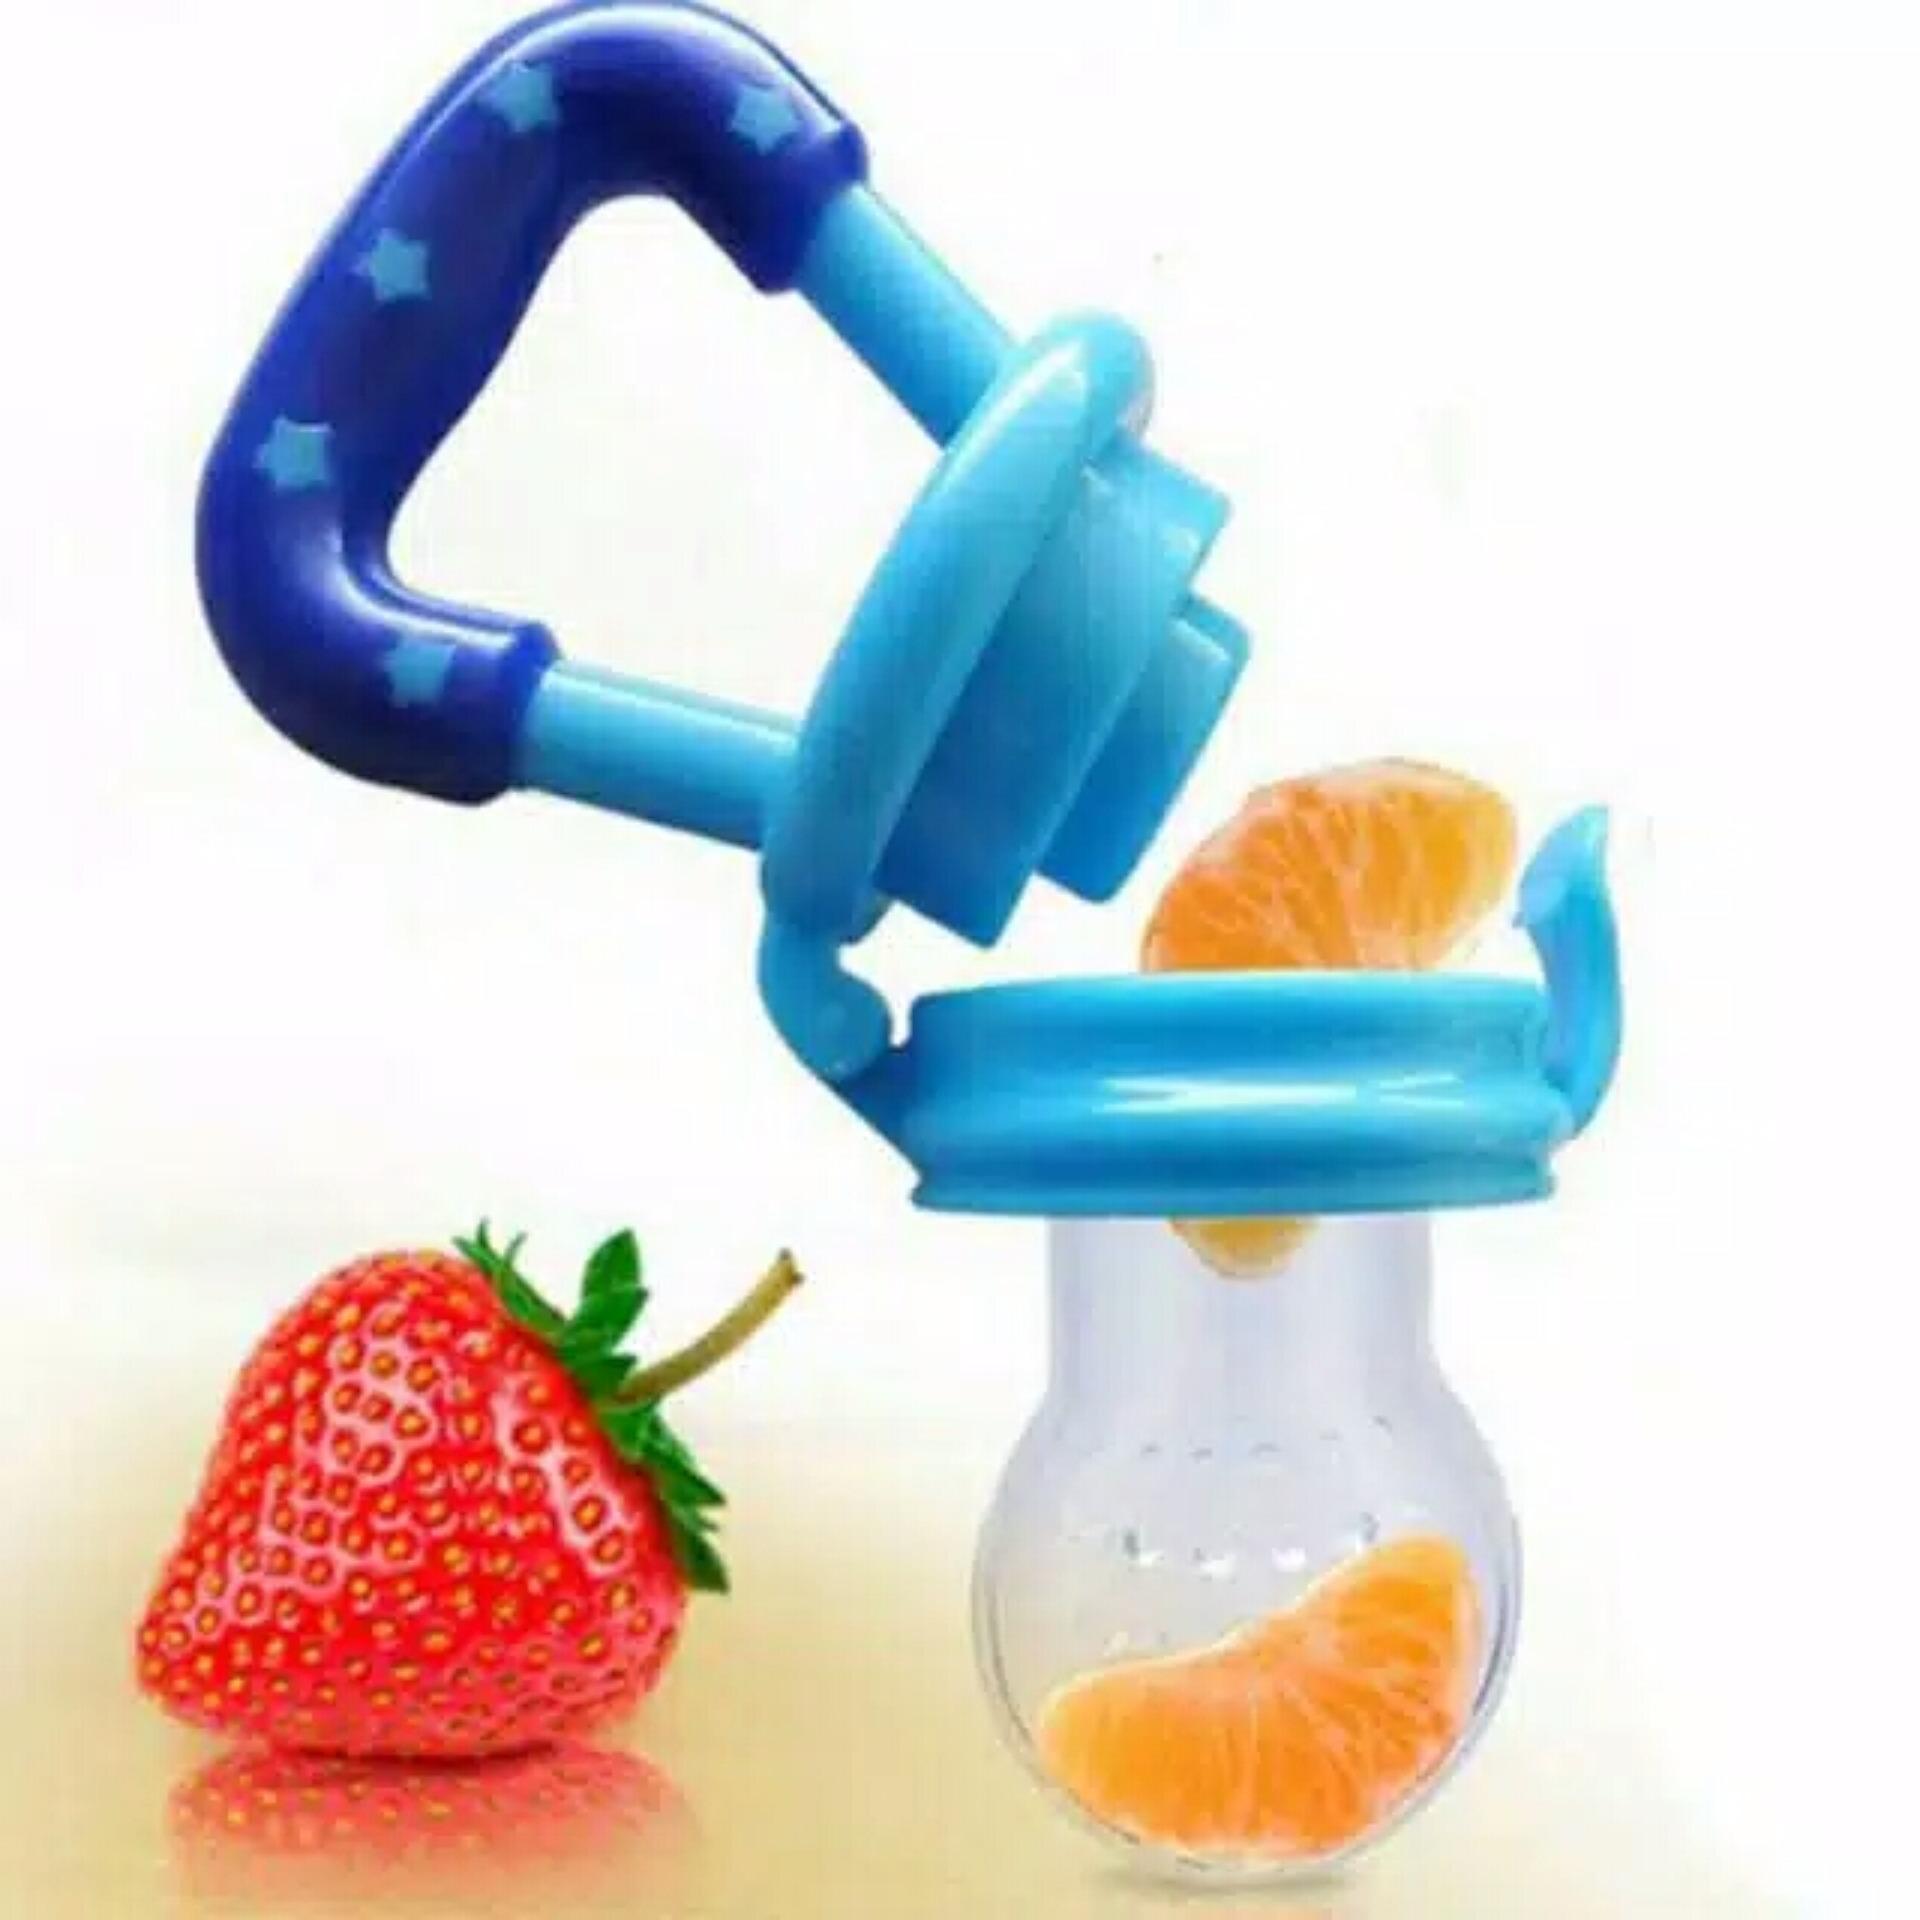 Fresh Food Feeder - empeng buah - Alat makan buah MPASI bayi - Teether buah -